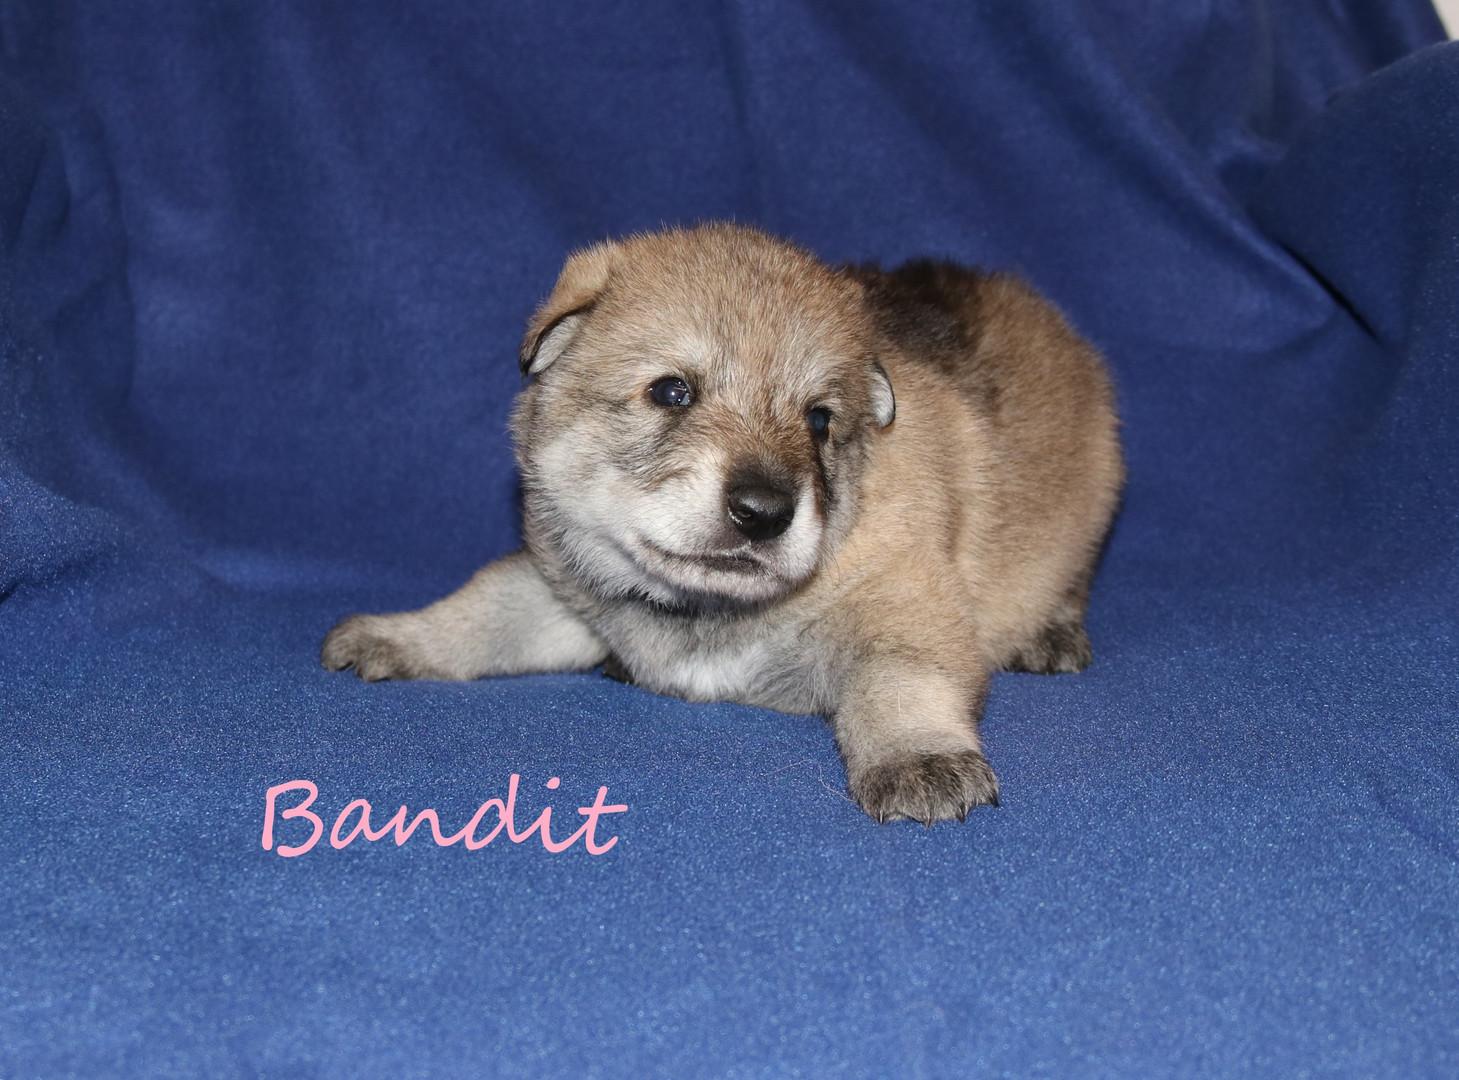 Bandit 30.11.2018